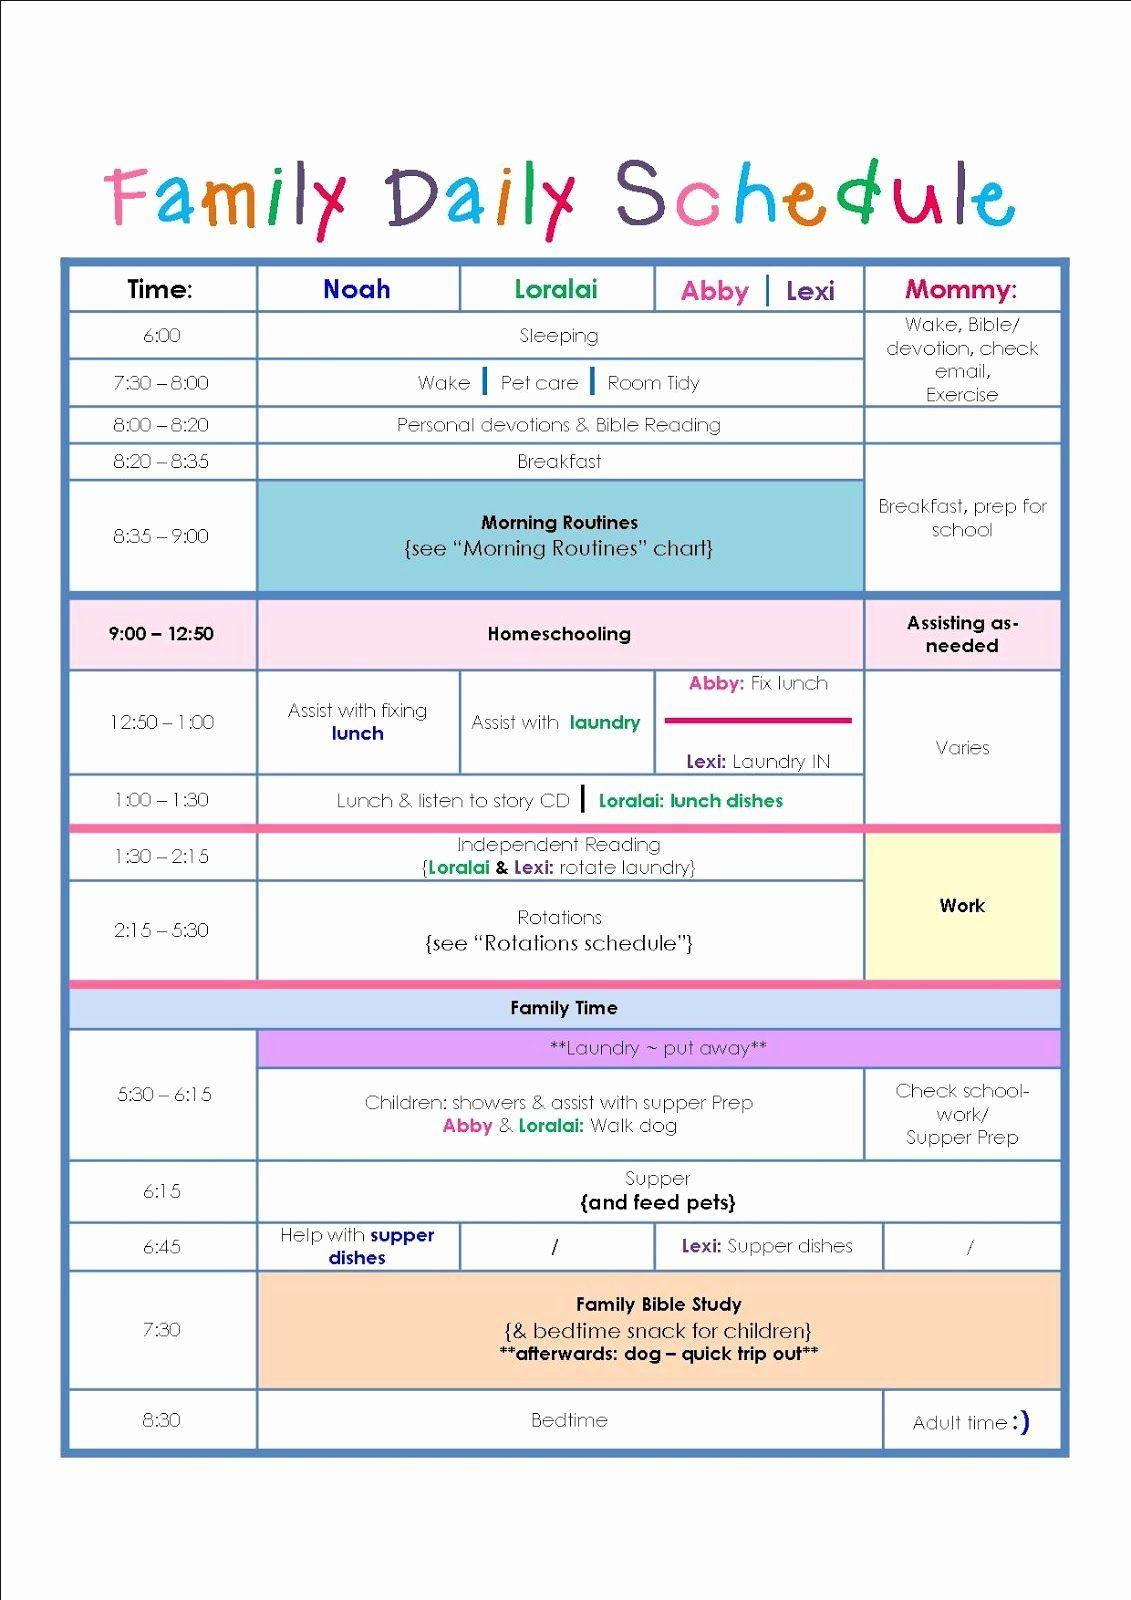 Daily Schedule Free Printable Homeschool Schedule Printable Daily Schedule Template Schedule Printable Free